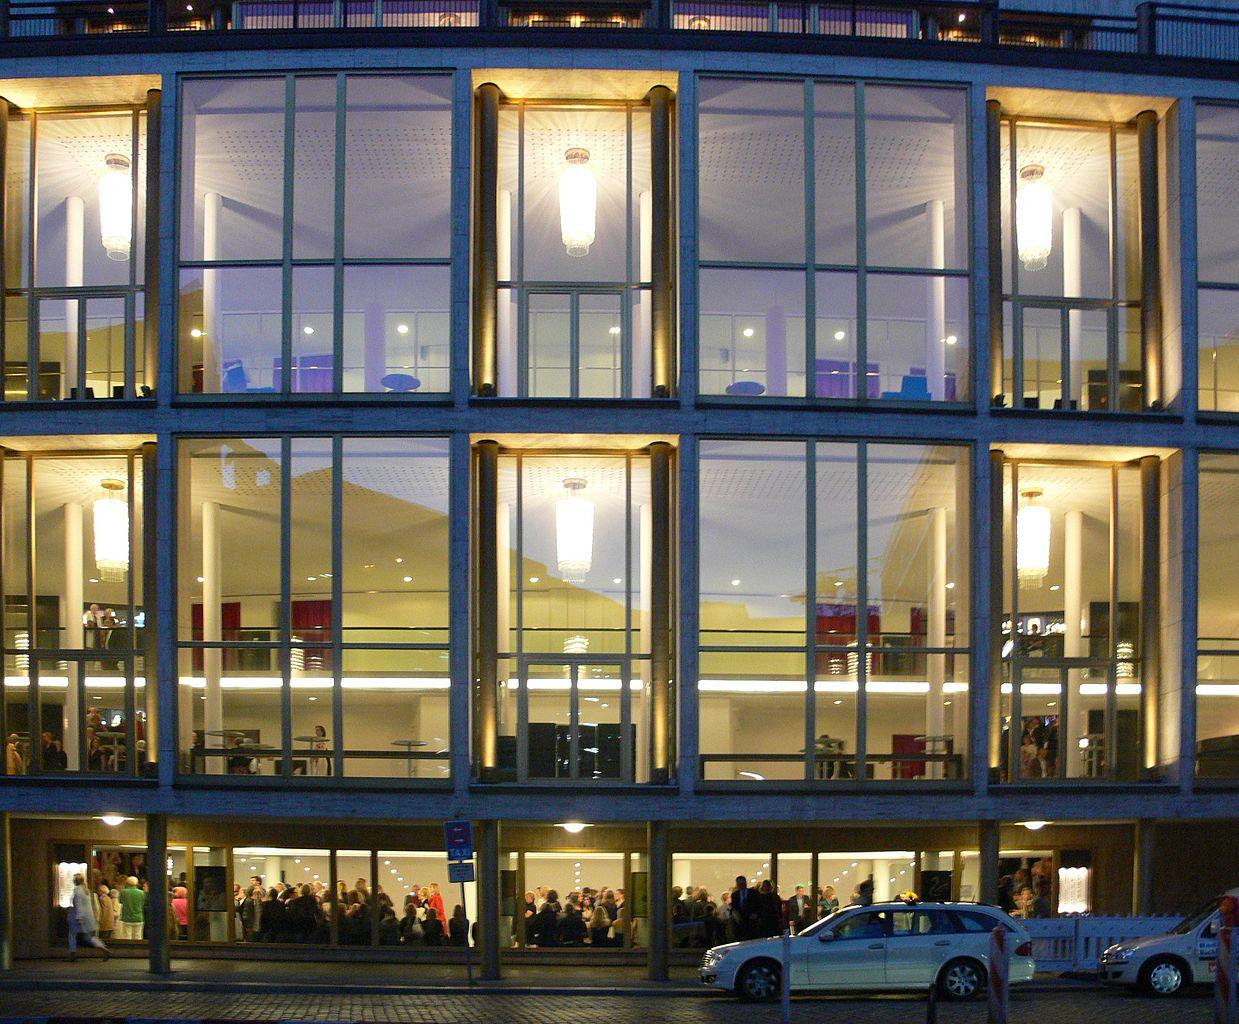 Гамбургский оперный театр, фасад